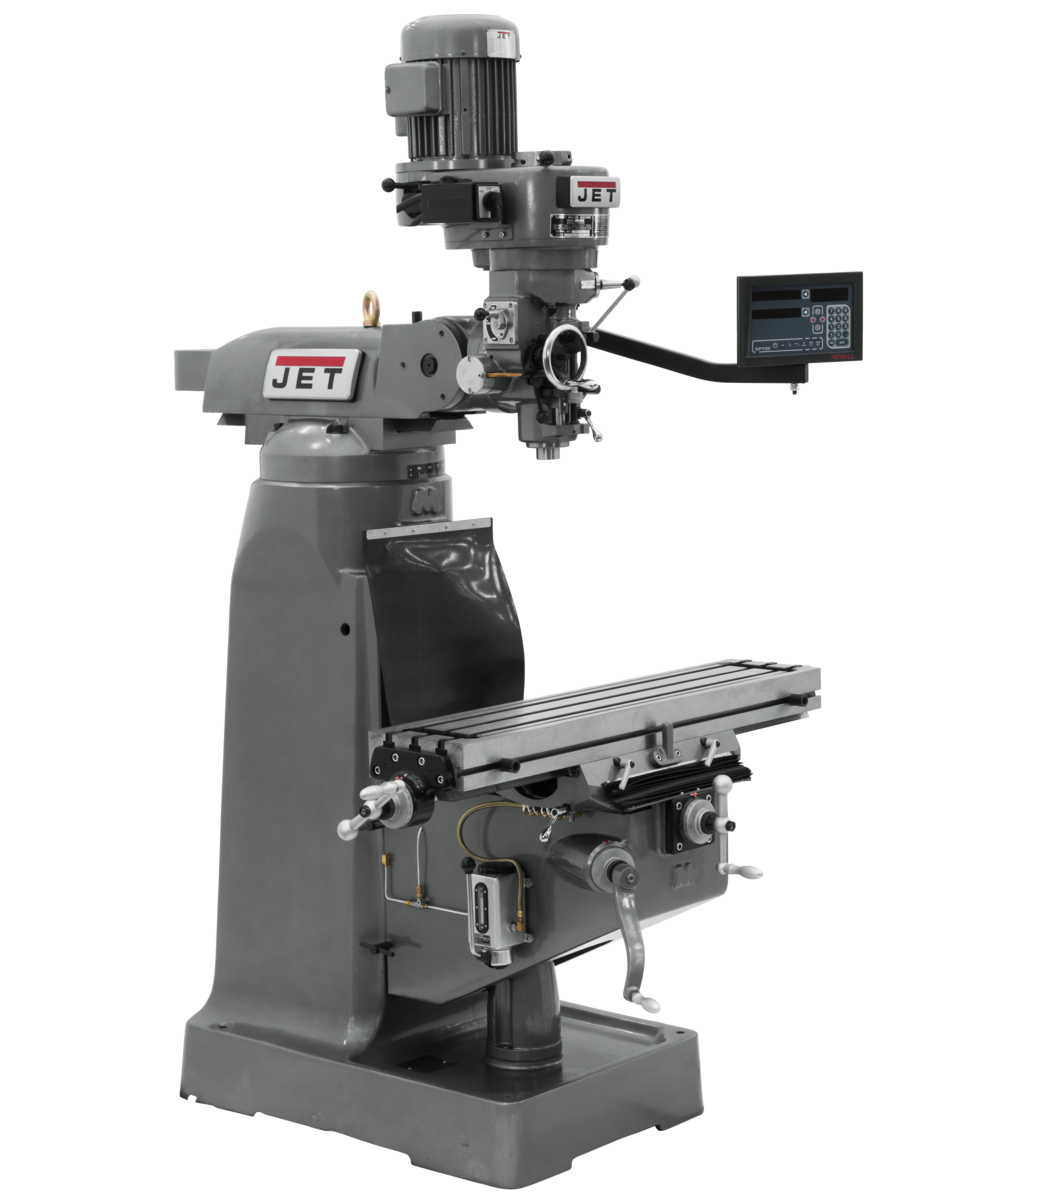 Fresadora JVM-836-1 con visualizador de posición digital NEWALL DP700 (consola) de 3 ejes